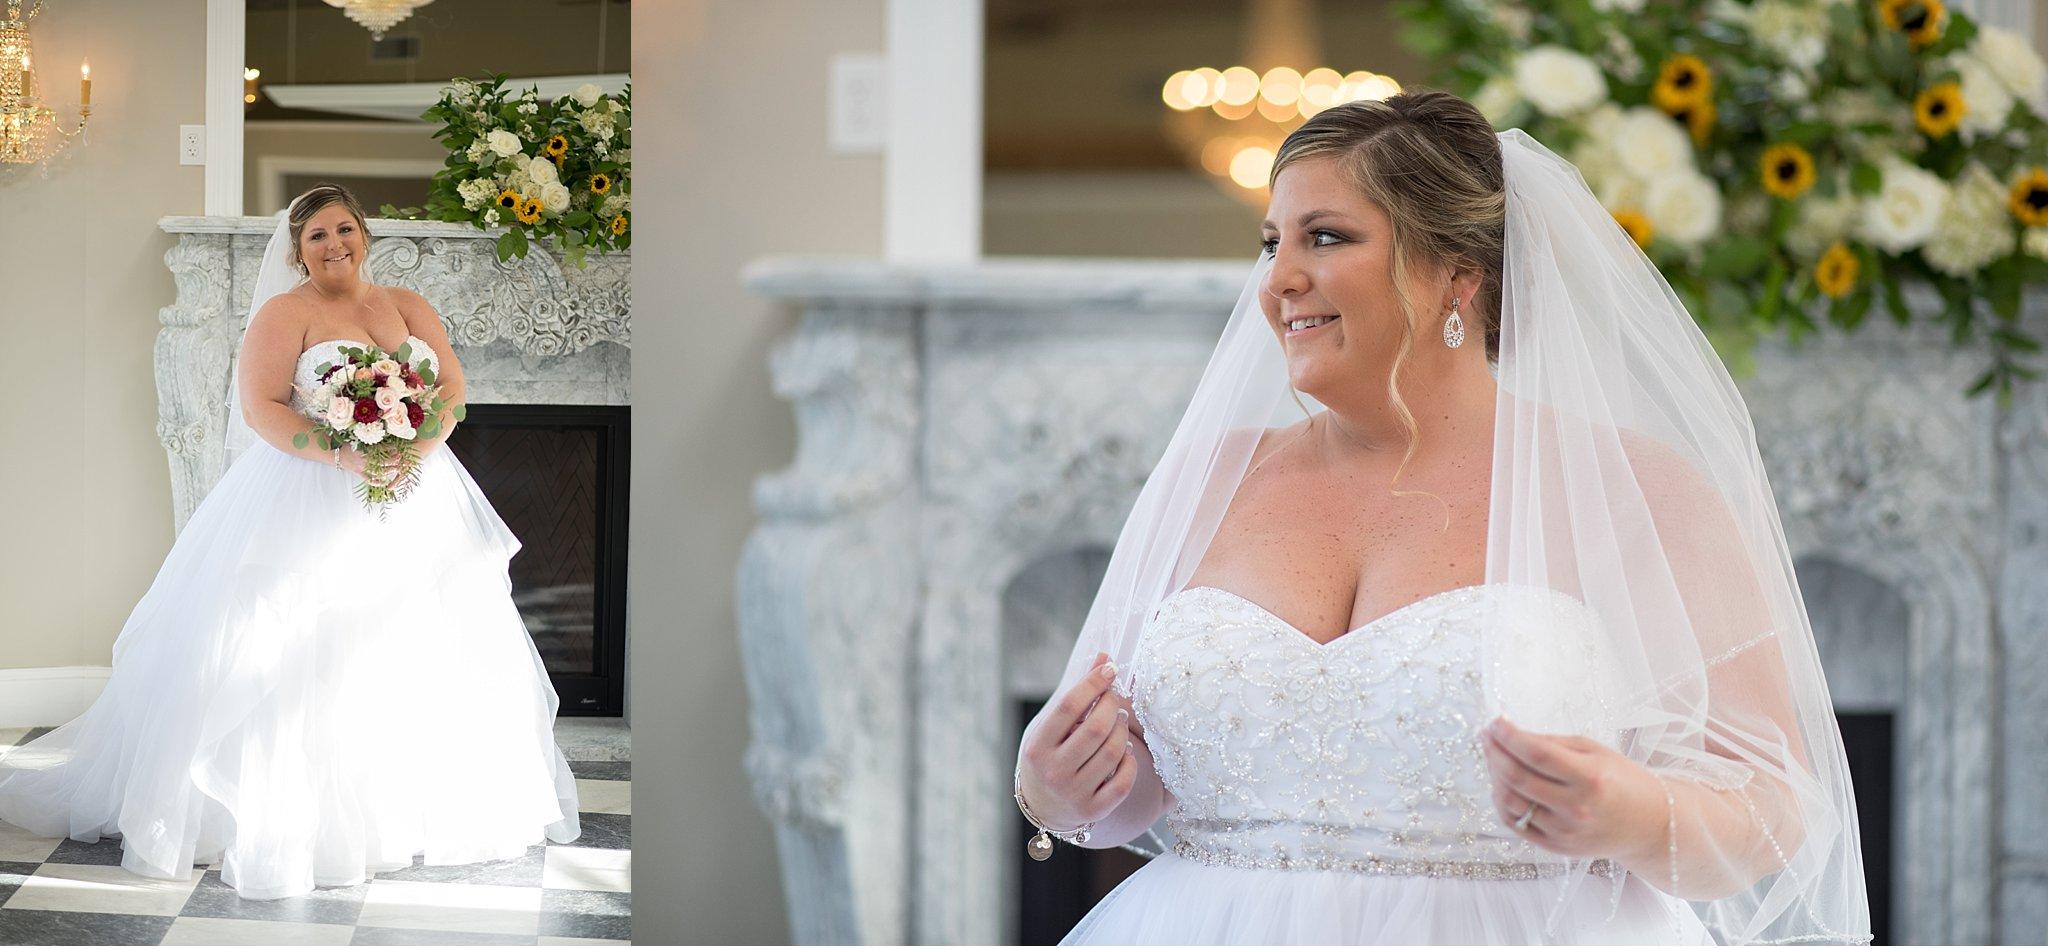 Cameron Estate Inn bridal detail Lancaster County wedding and engagement photographer photo